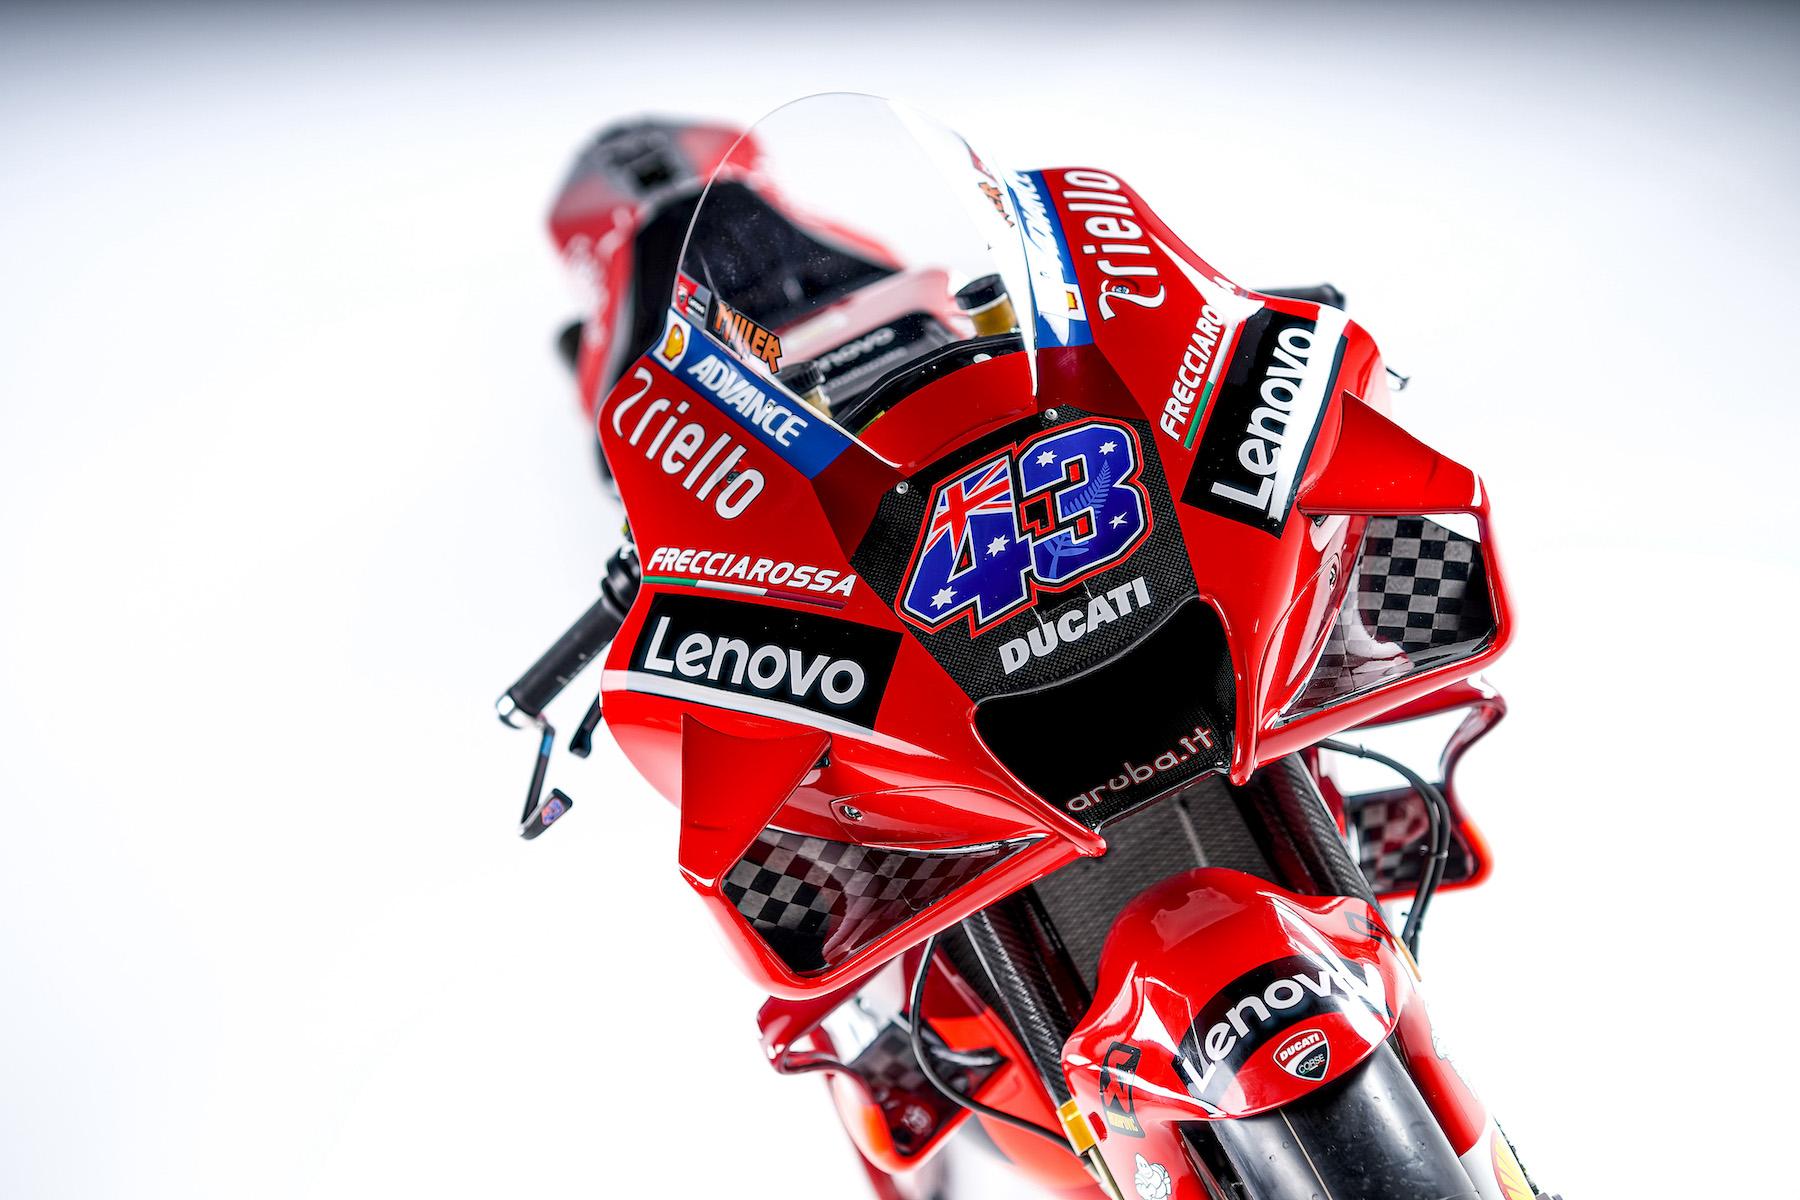 Ducati Lenovoチーム ジャック・ミラー ギャラリー